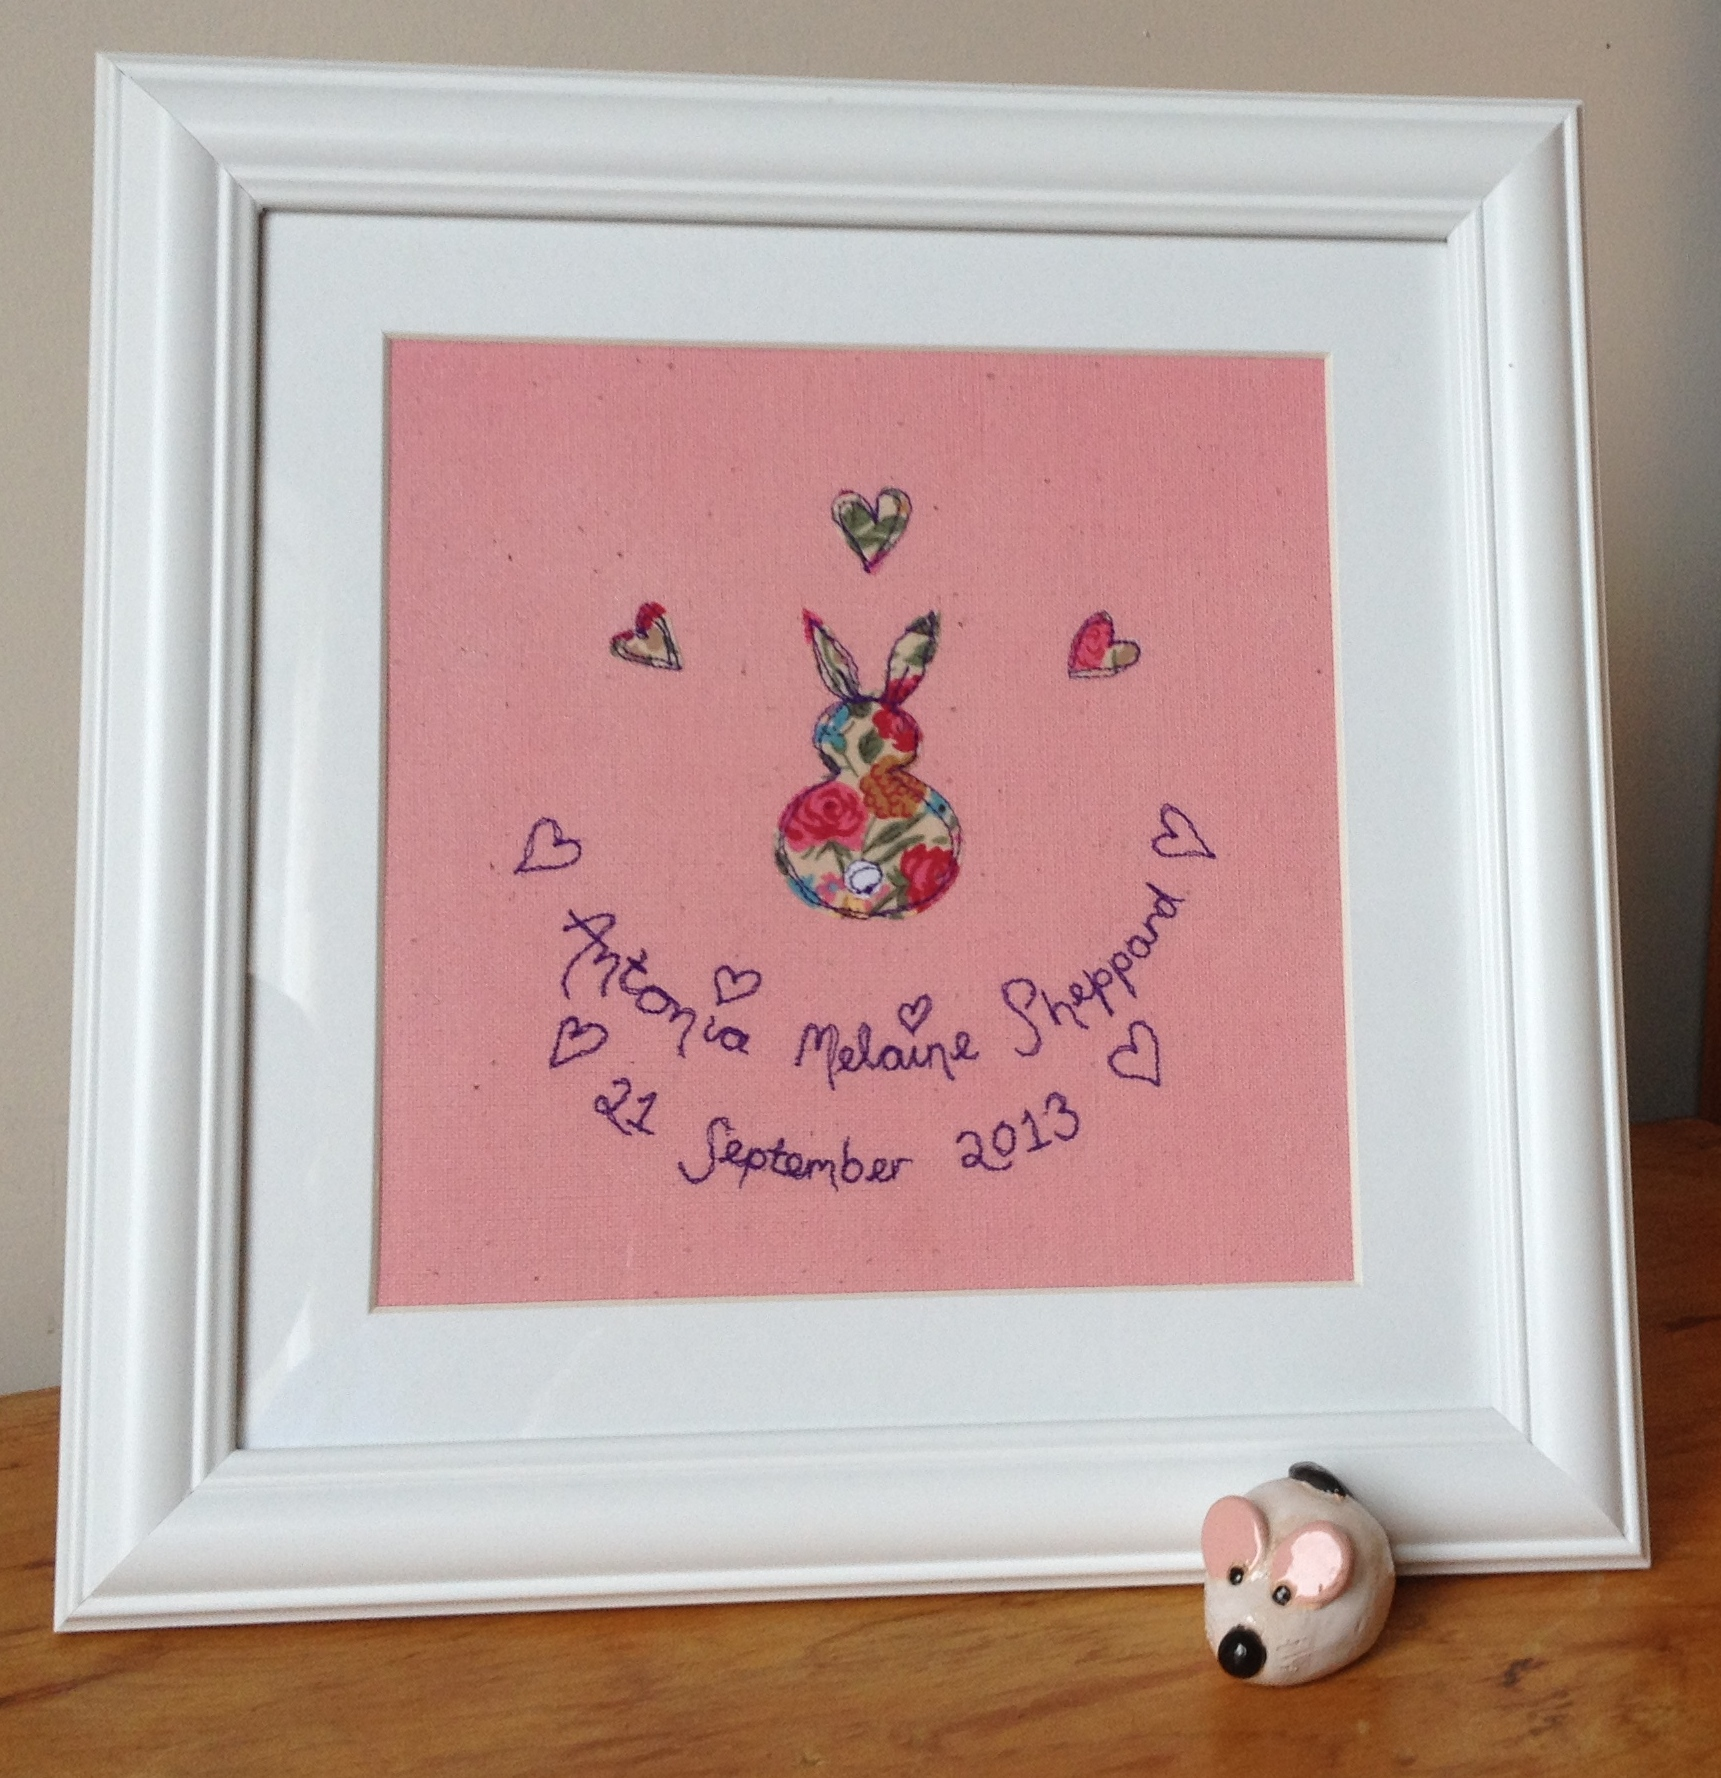 Lovely Bunny - £25 + p&p